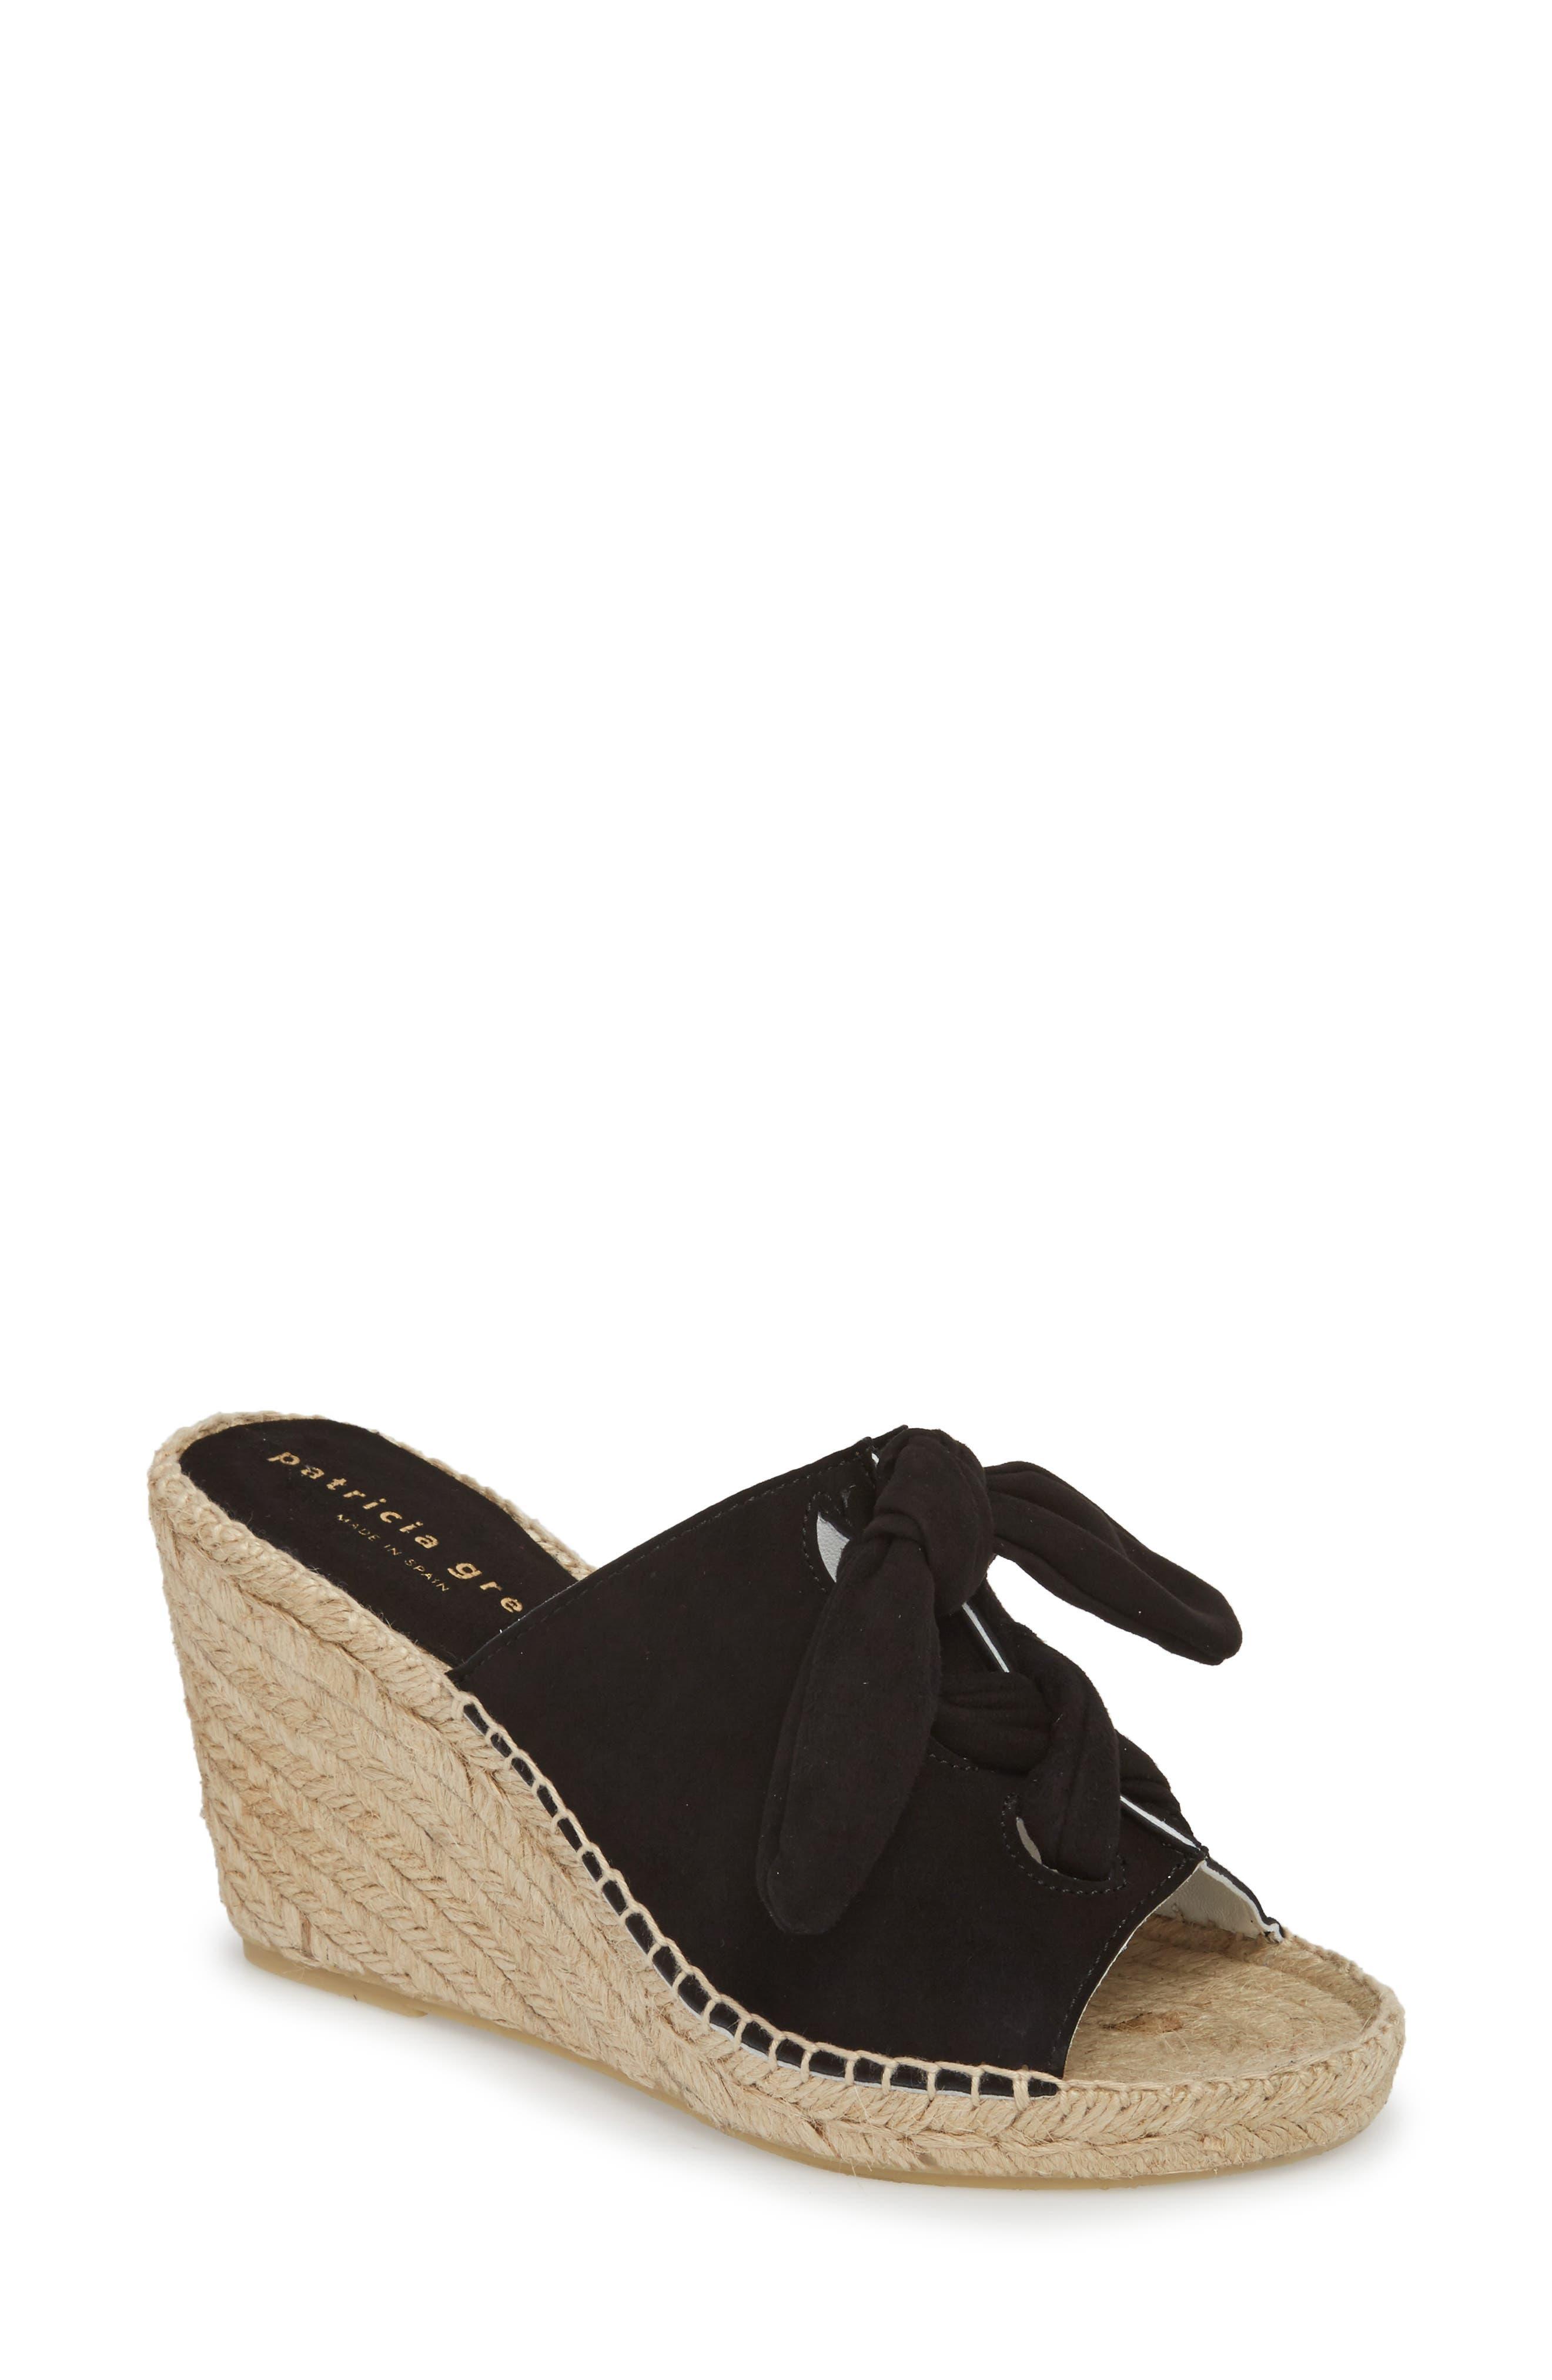 Flirt Espadrille Wedge Sandal,                         Main,                         color, 001